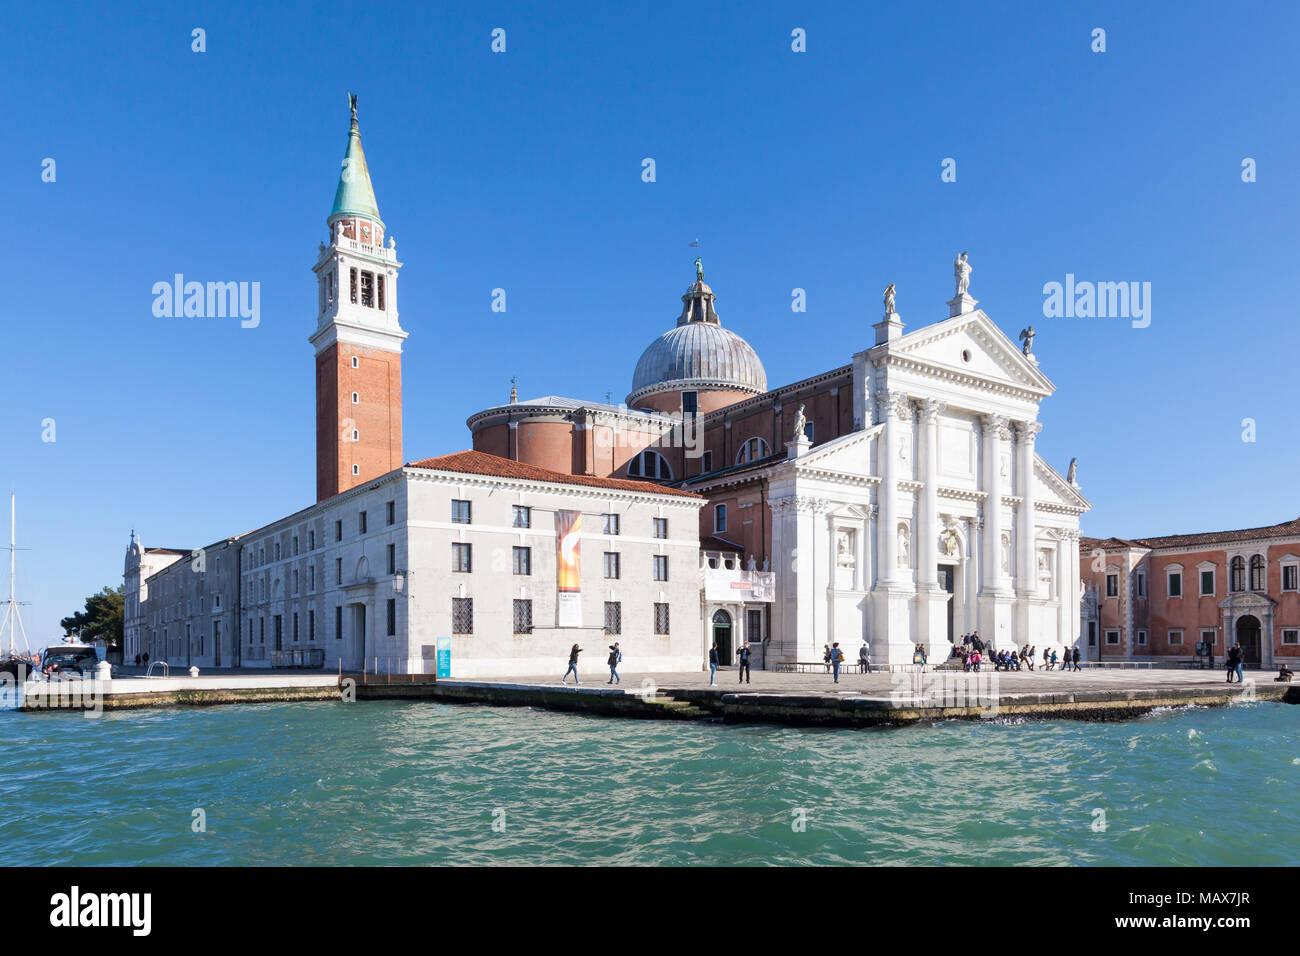 Isola di San Giorgio Maggiore von Basino San Marco und dem Canale della Giudecca, Venedig, Venetien, Italien auf einem blauen Himmel sonnigen Tag. Von Andrea Palladio entworfen Stockbild